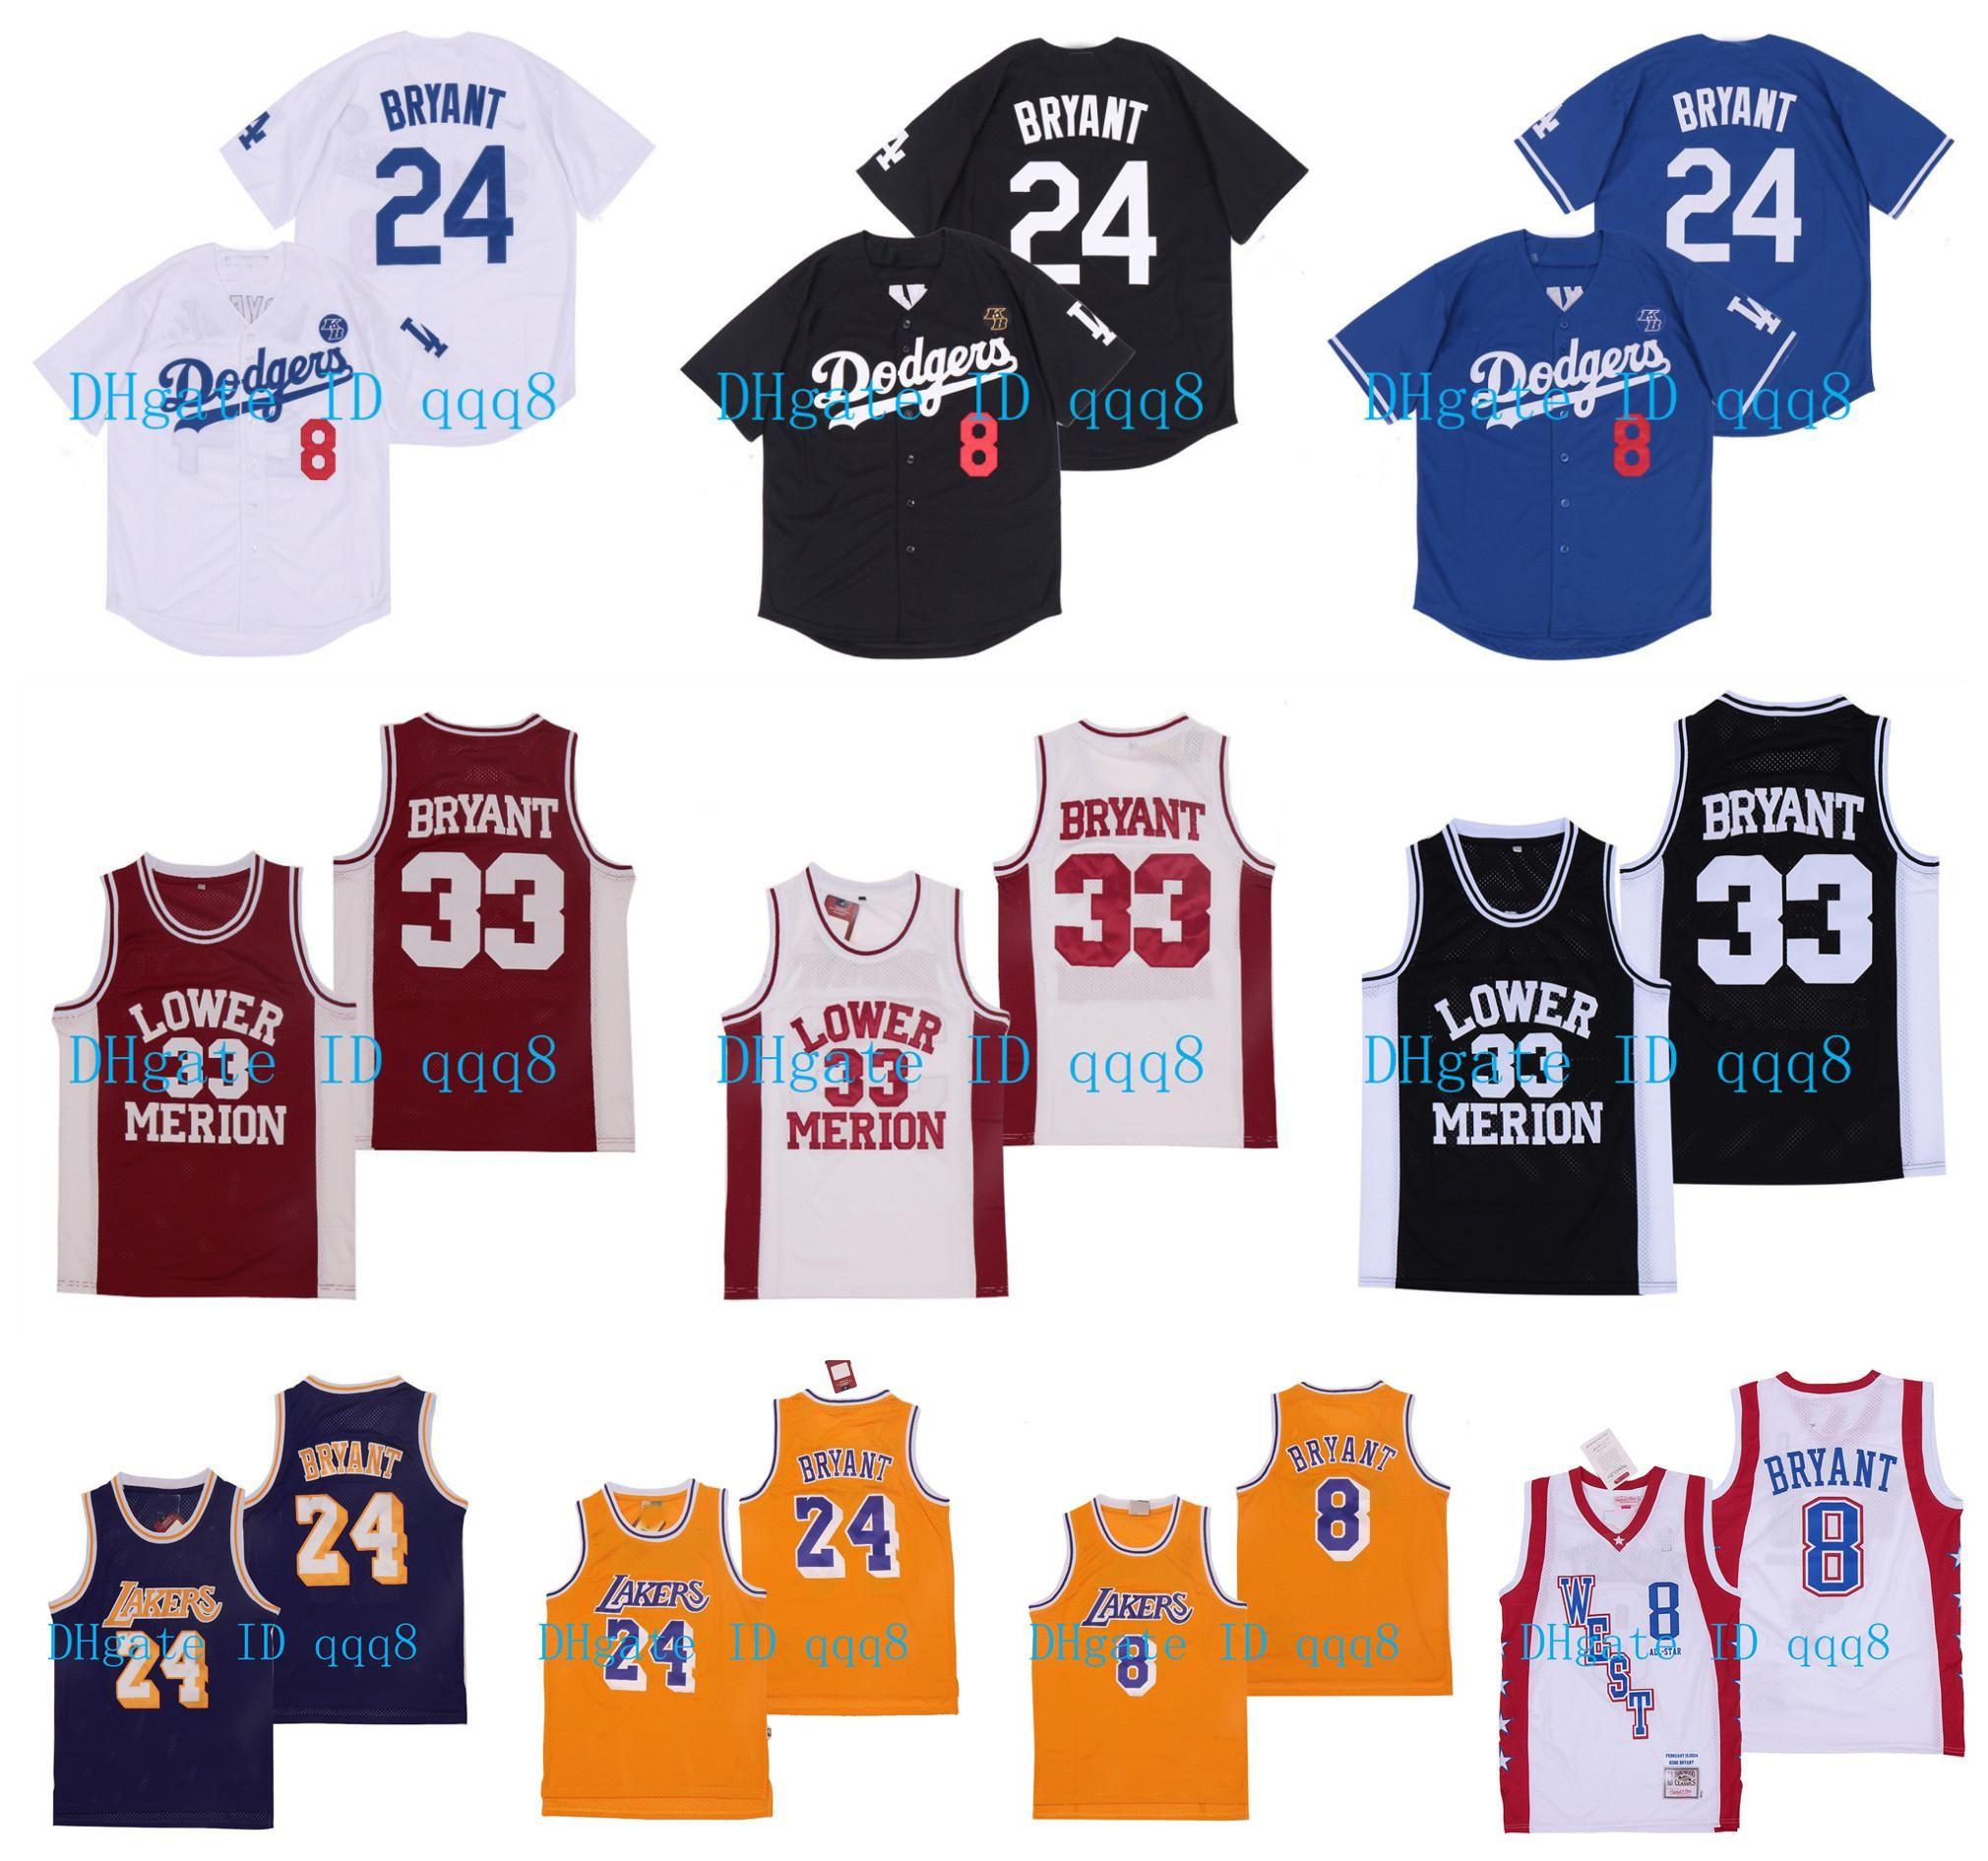 NCAA NCAA ниже Merion 33 Брайант Джерси 8 24 Брайант с бейсболом KBPatch Jersey 2004 West All Star Bryant College Basketball майки